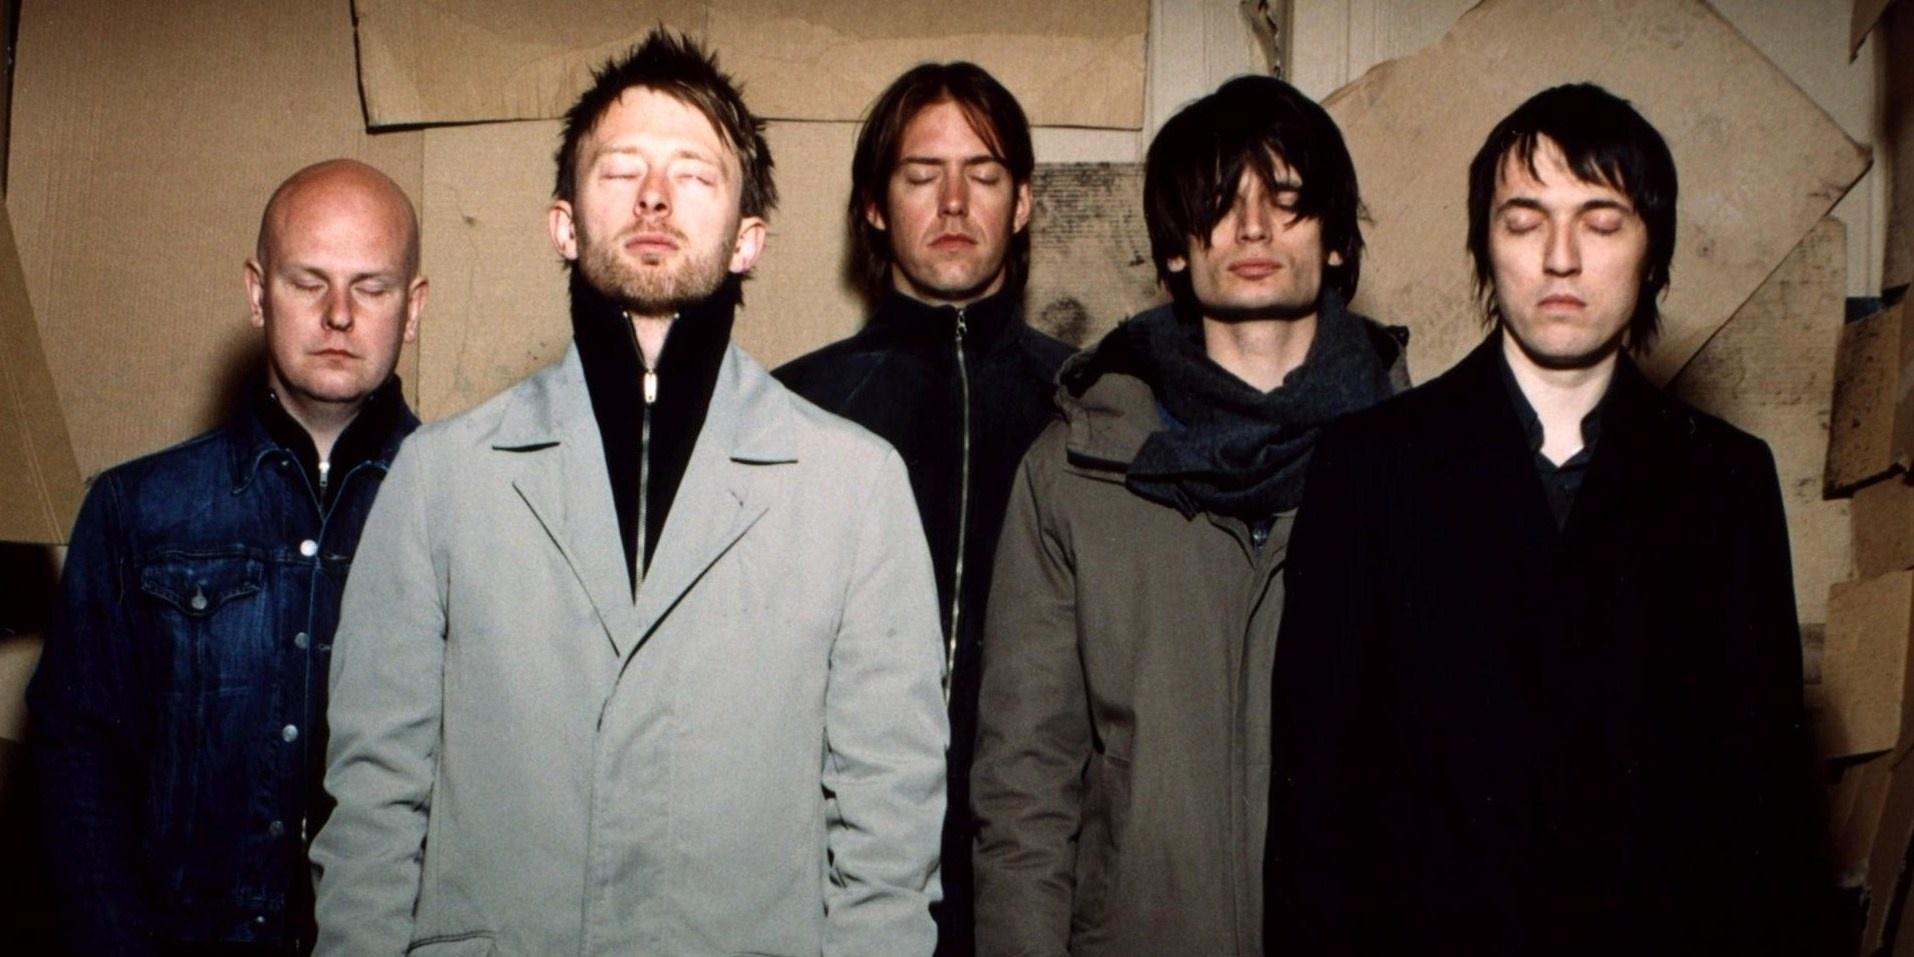 Radiohead to headline Primavera Sound 2016, full line-up revealed